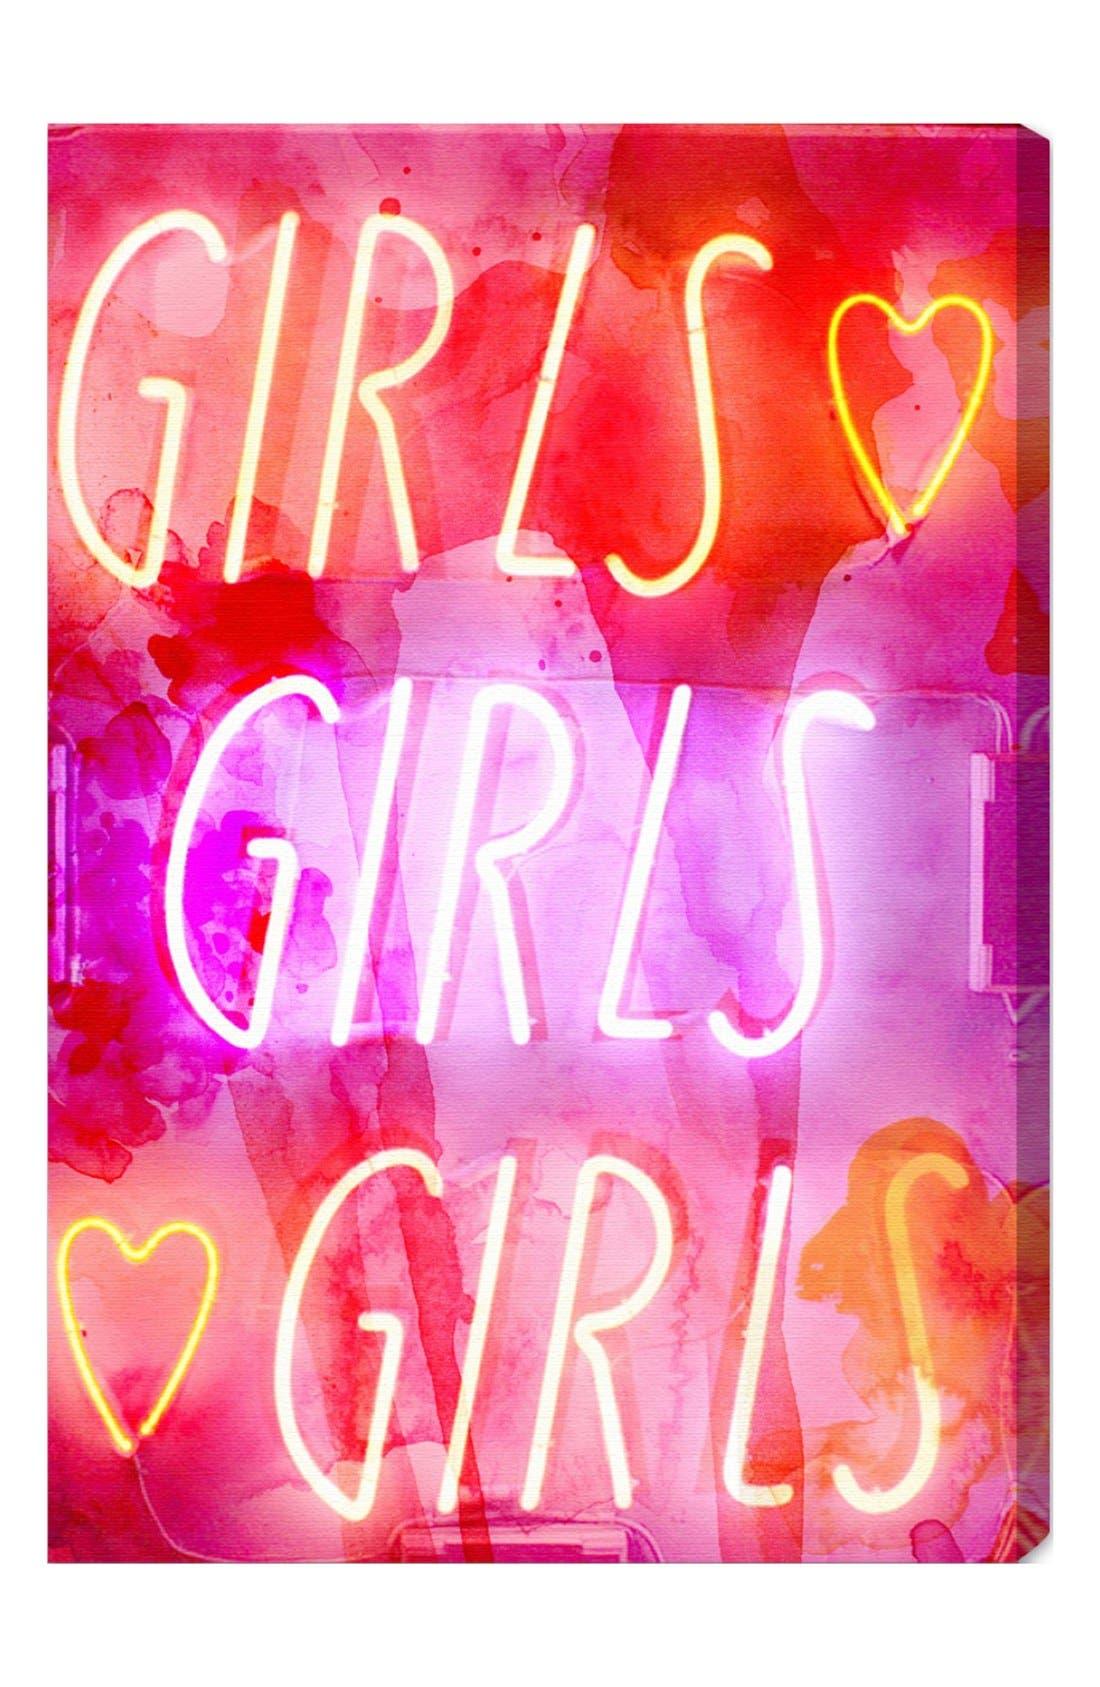 Alternate Image 1 Selected - Oliver Gal 'Girls Girls Girls' Wall Art